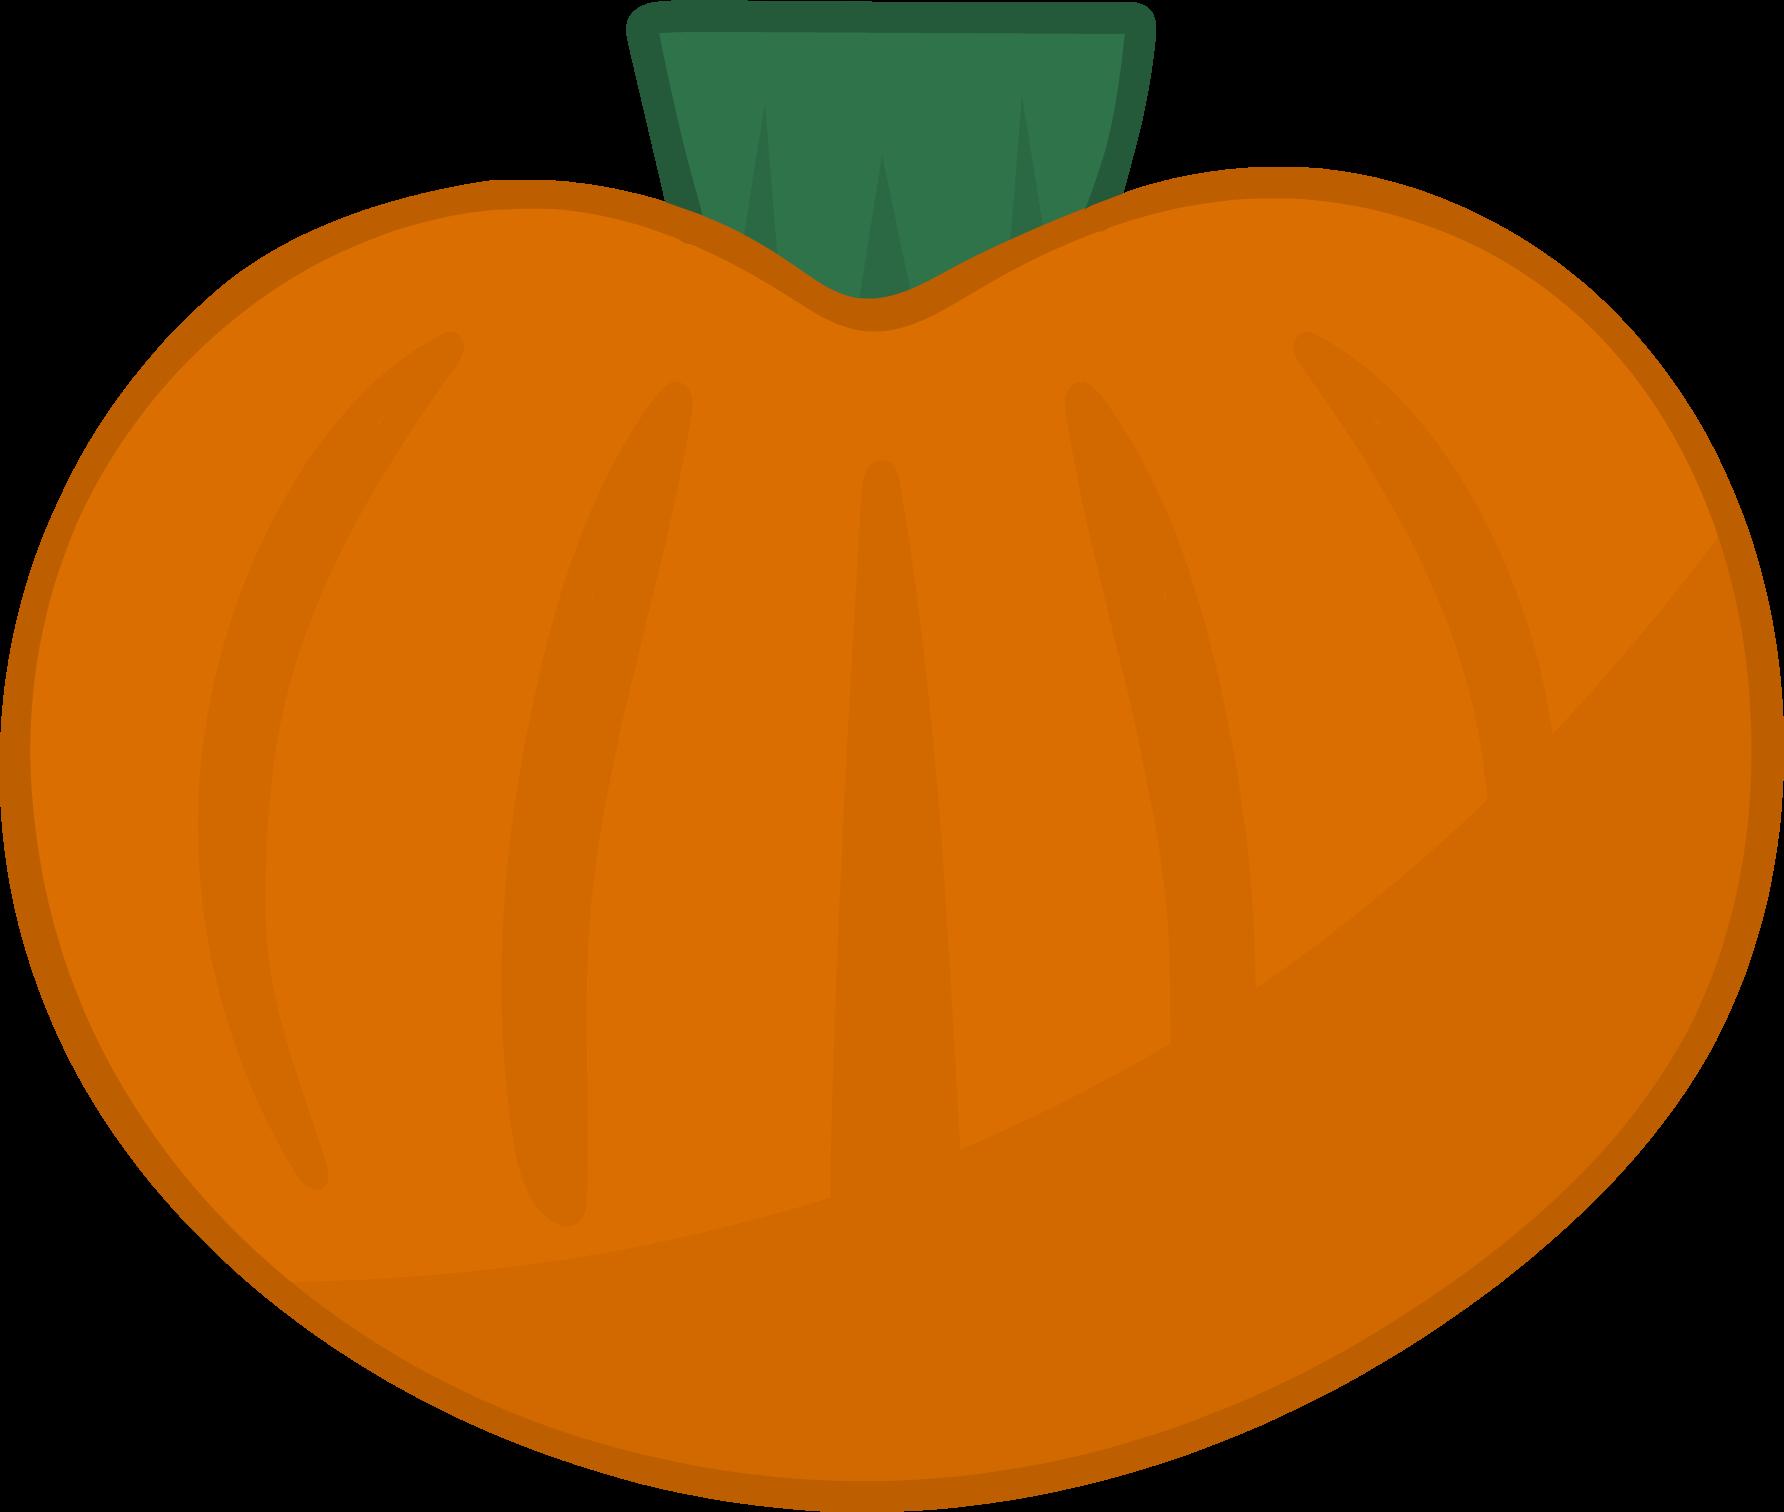 Top down view of a pumpkin clipart clip art free stock Image - Pumpkin.png | Object Lockdown Wiki | FANDOM powered by Wikia clip art free stock